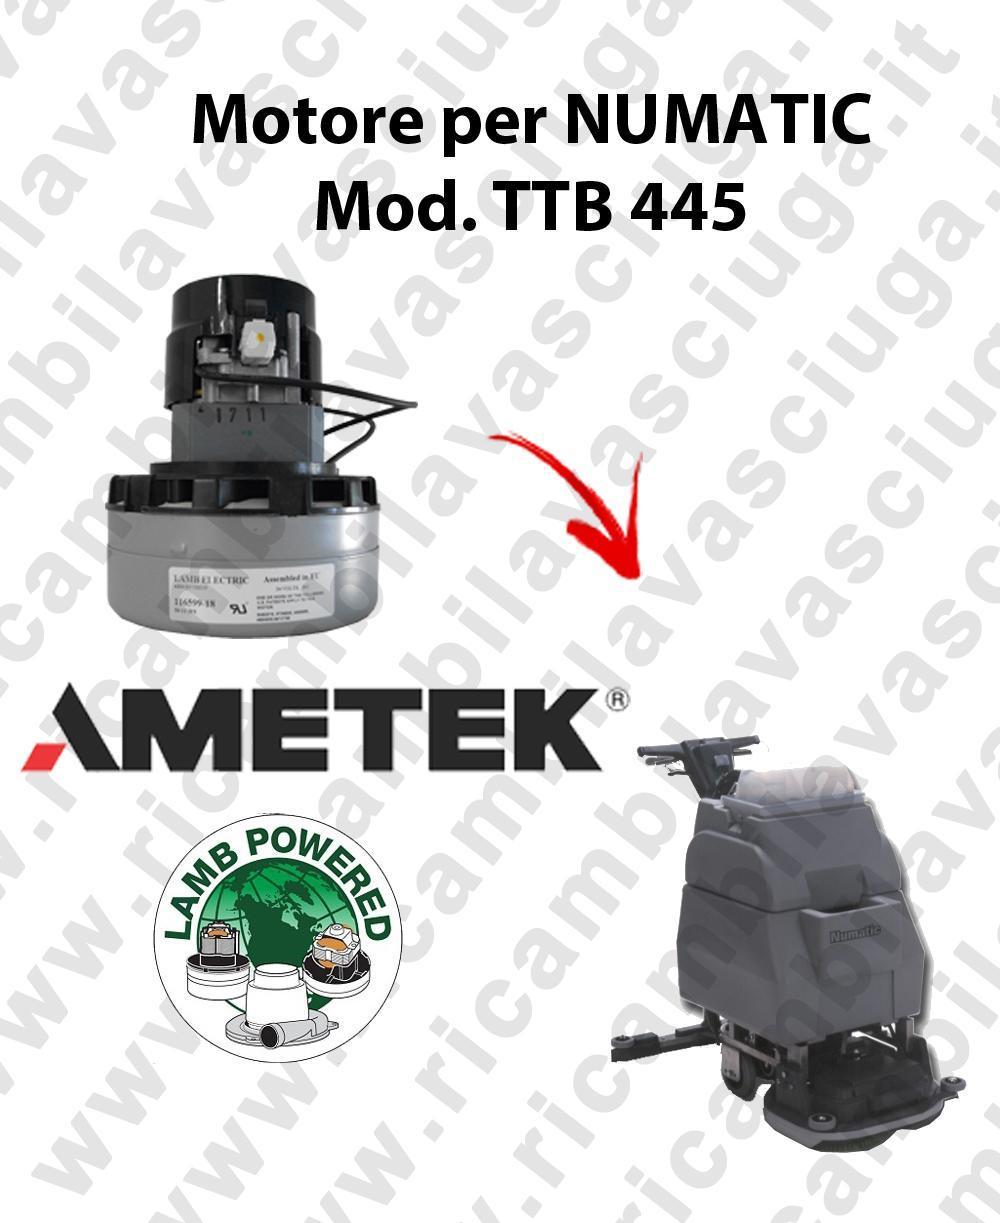 TTB 445 motor de aspiración AMETEK fregadora NUMATIC